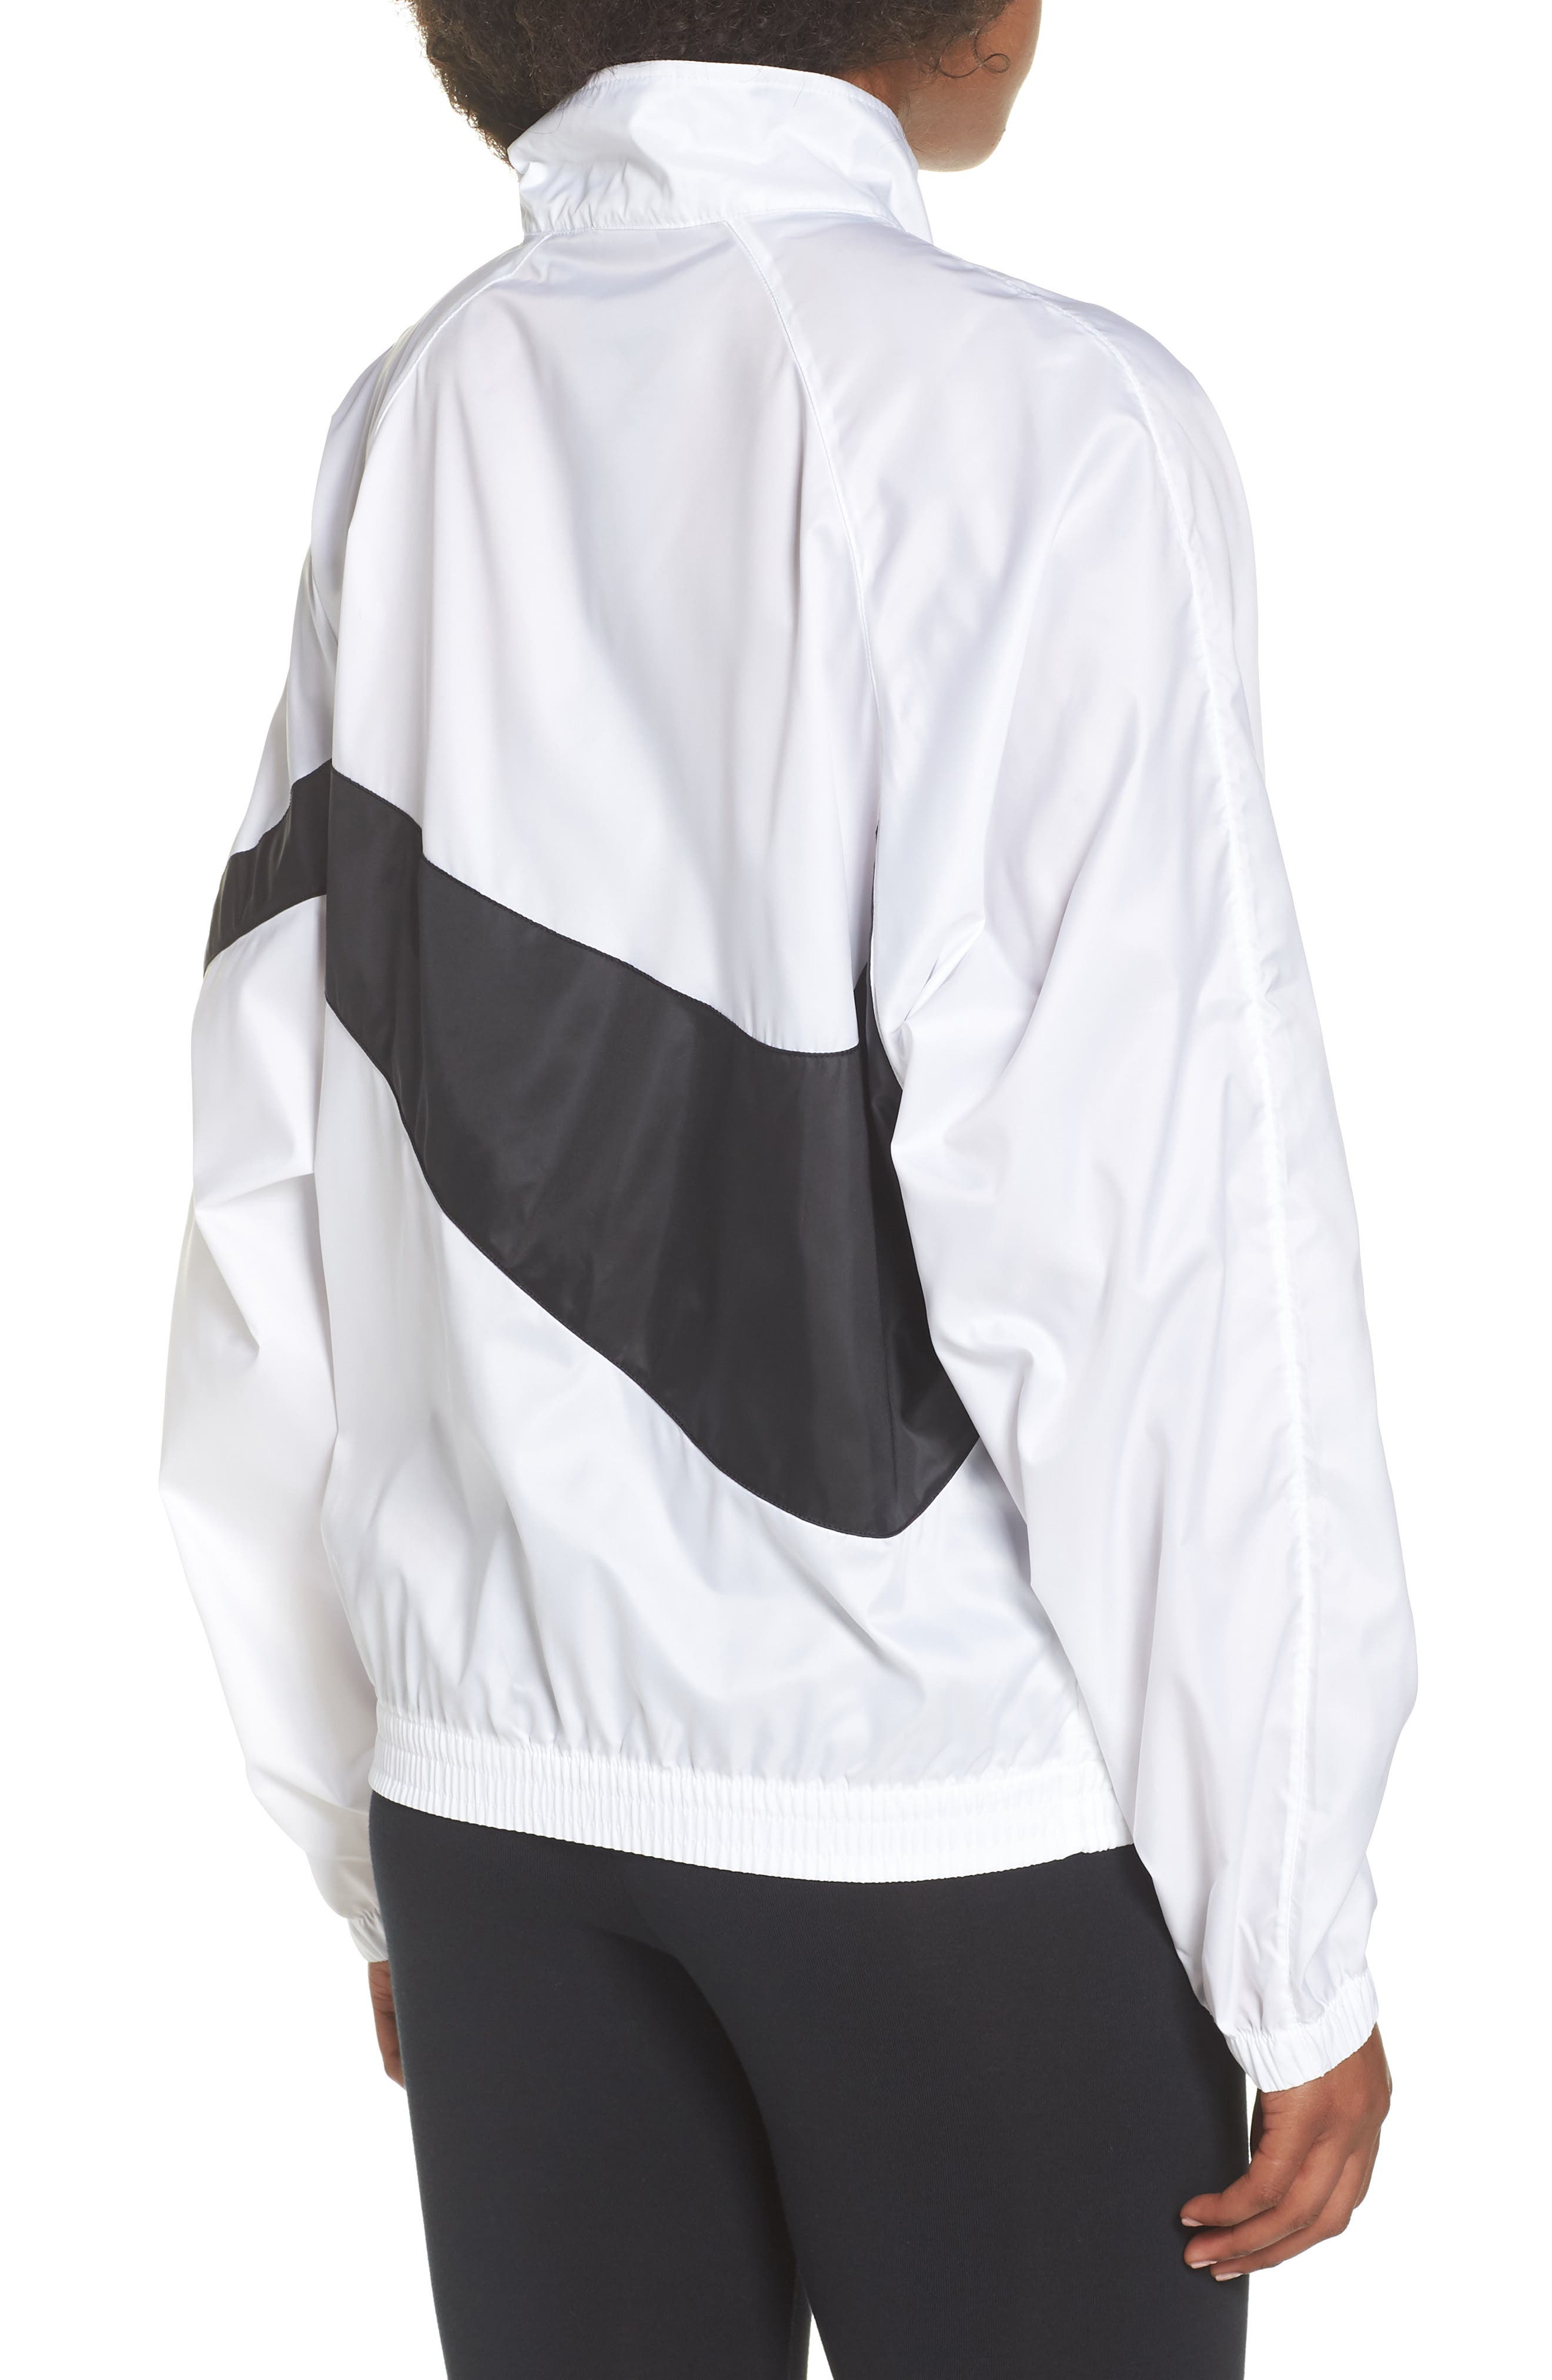 NikeLab Collection Unisex Heritage Jacket,                             Alternate thumbnail 2, color,                             100